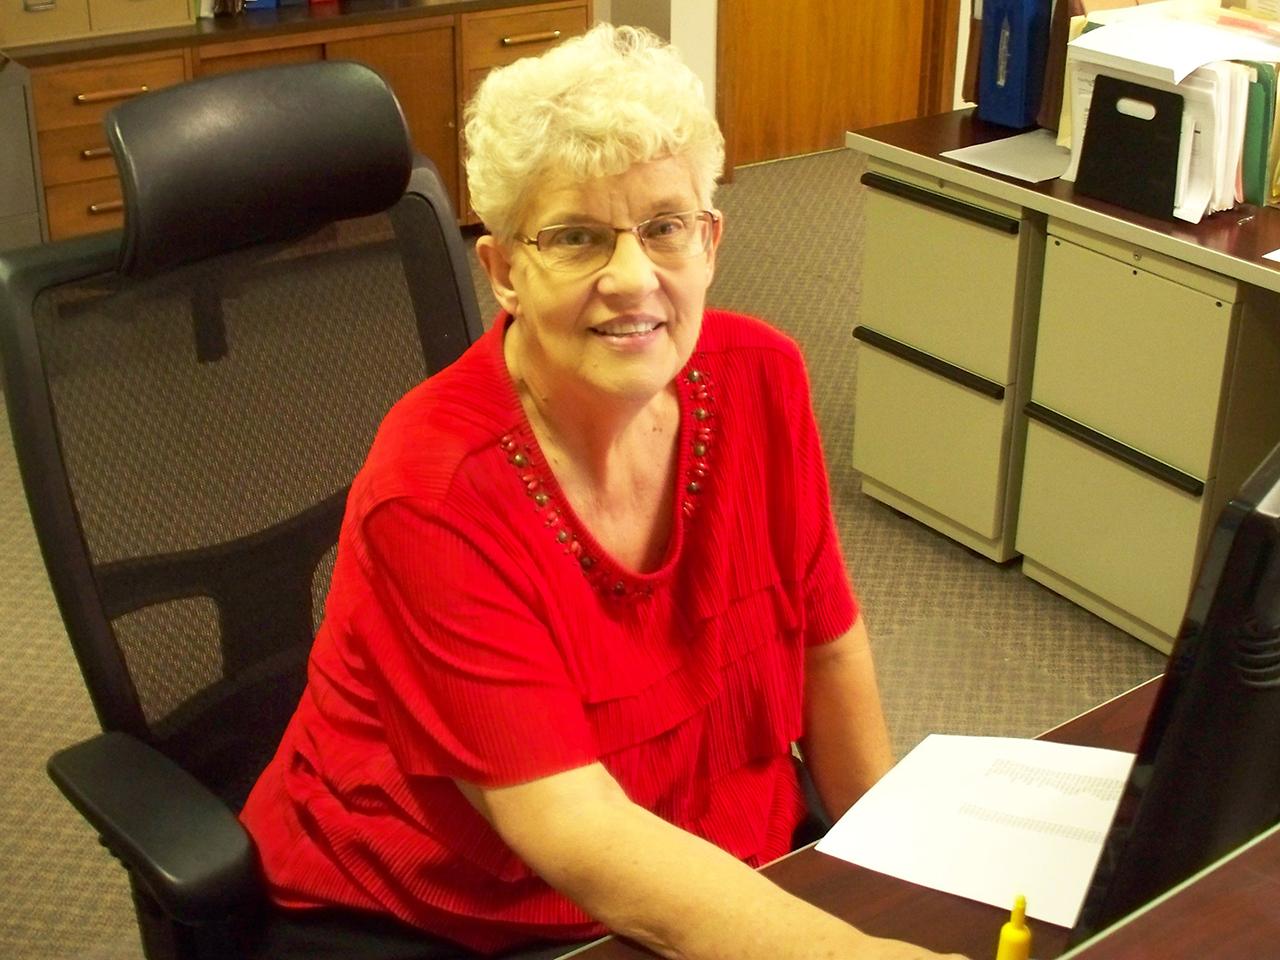 Village of Newark thanks Eleanor Palermo for 15 years of service as Deputy Clerk/Treasurer